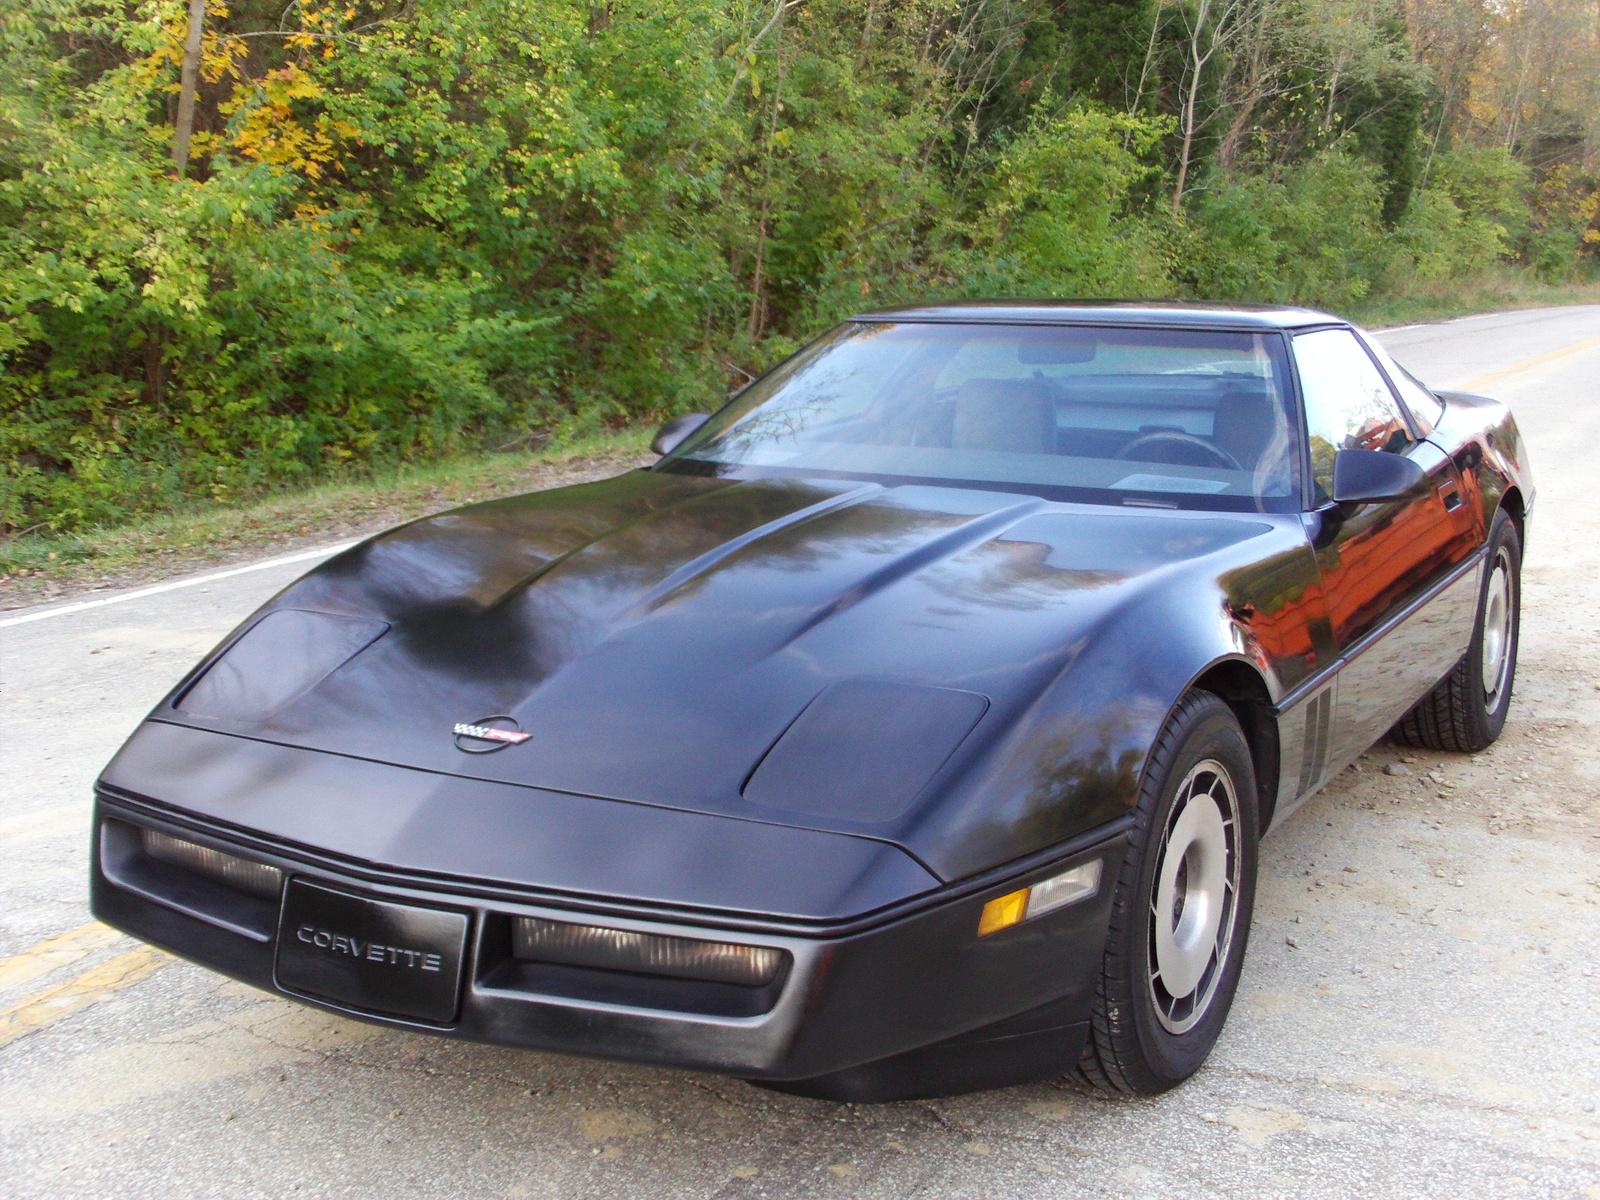 1985 c4 corvette for sale image details. Cars Review. Best American Auto & Cars Review